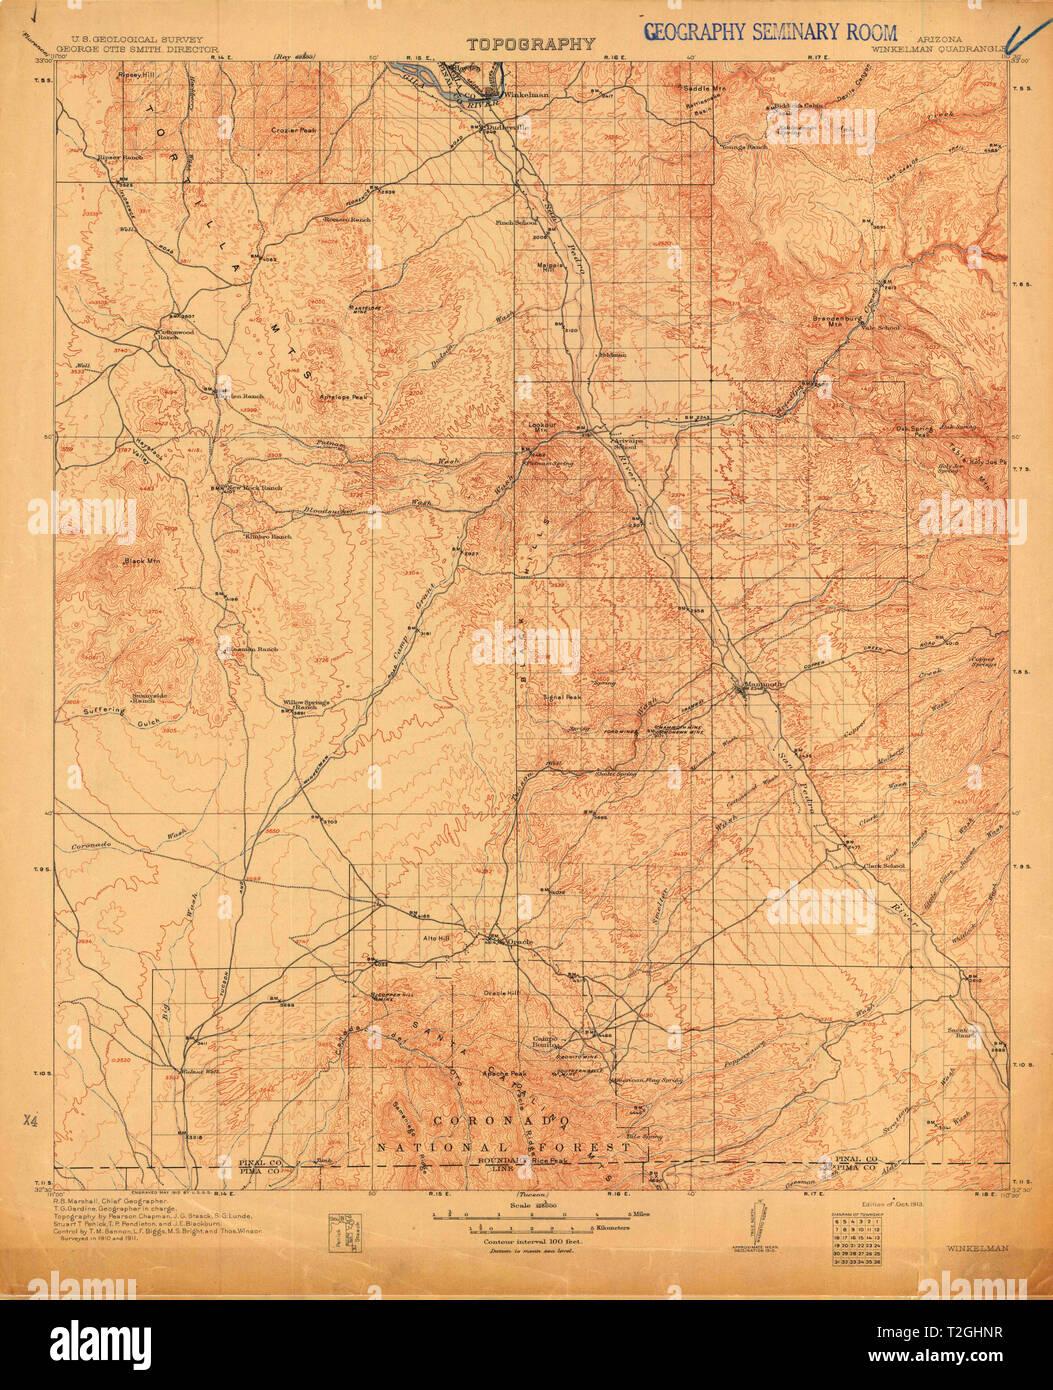 Topo Map Of Arizona.Usgs Topo Map Arizona Az Winkelman 705138 1913 125000 Restoration